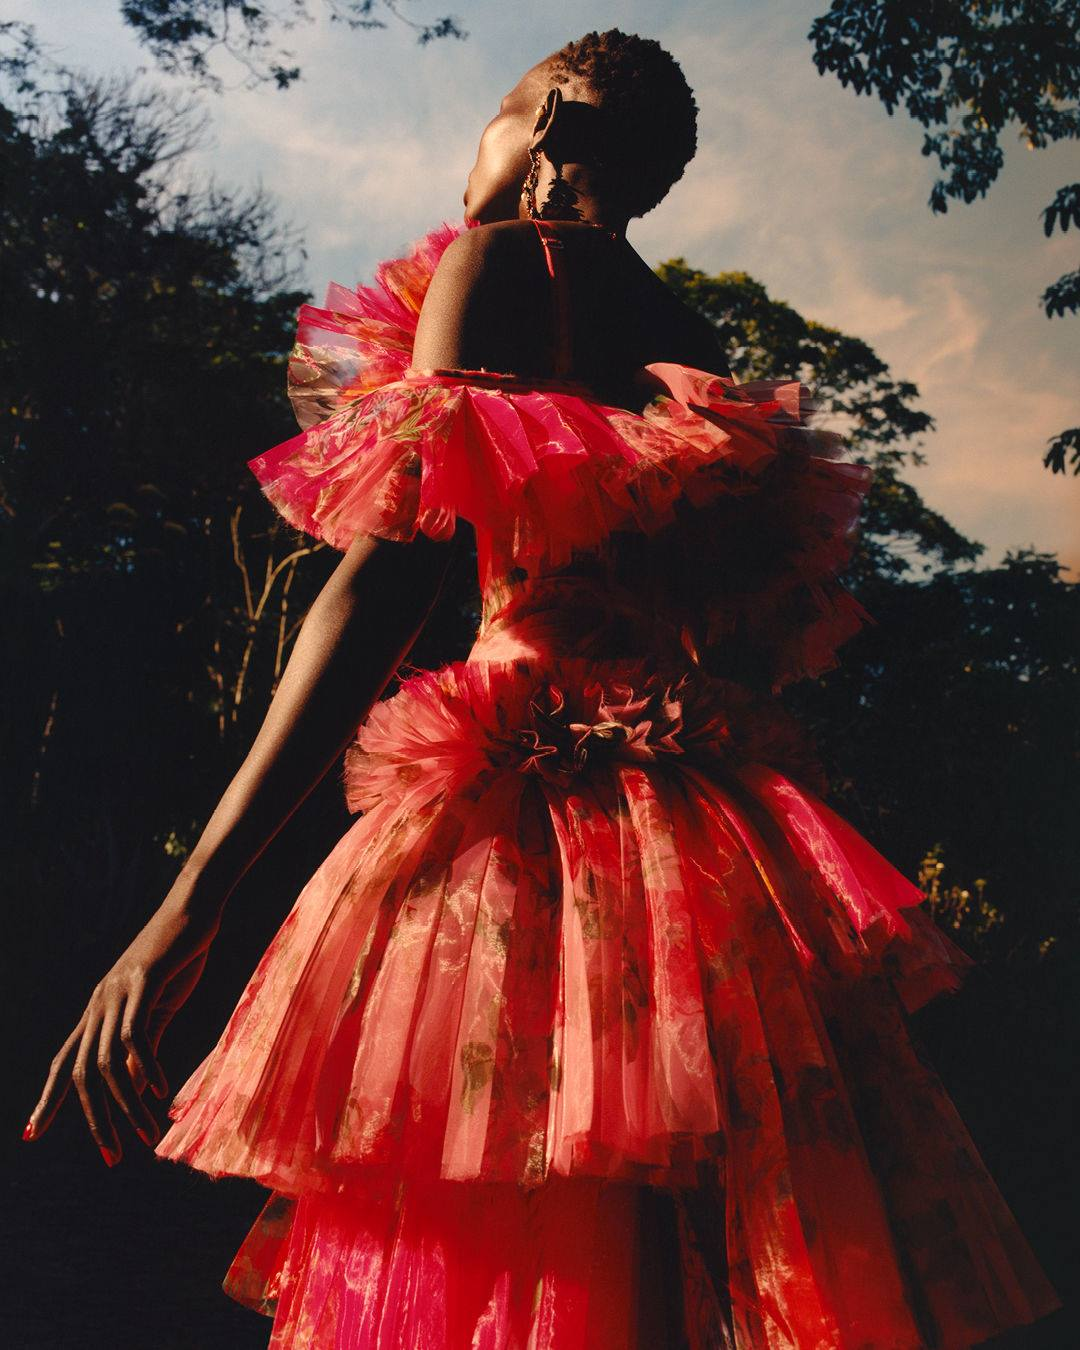 Alexander McQueen Spring Summer 2018 Ad Campaign